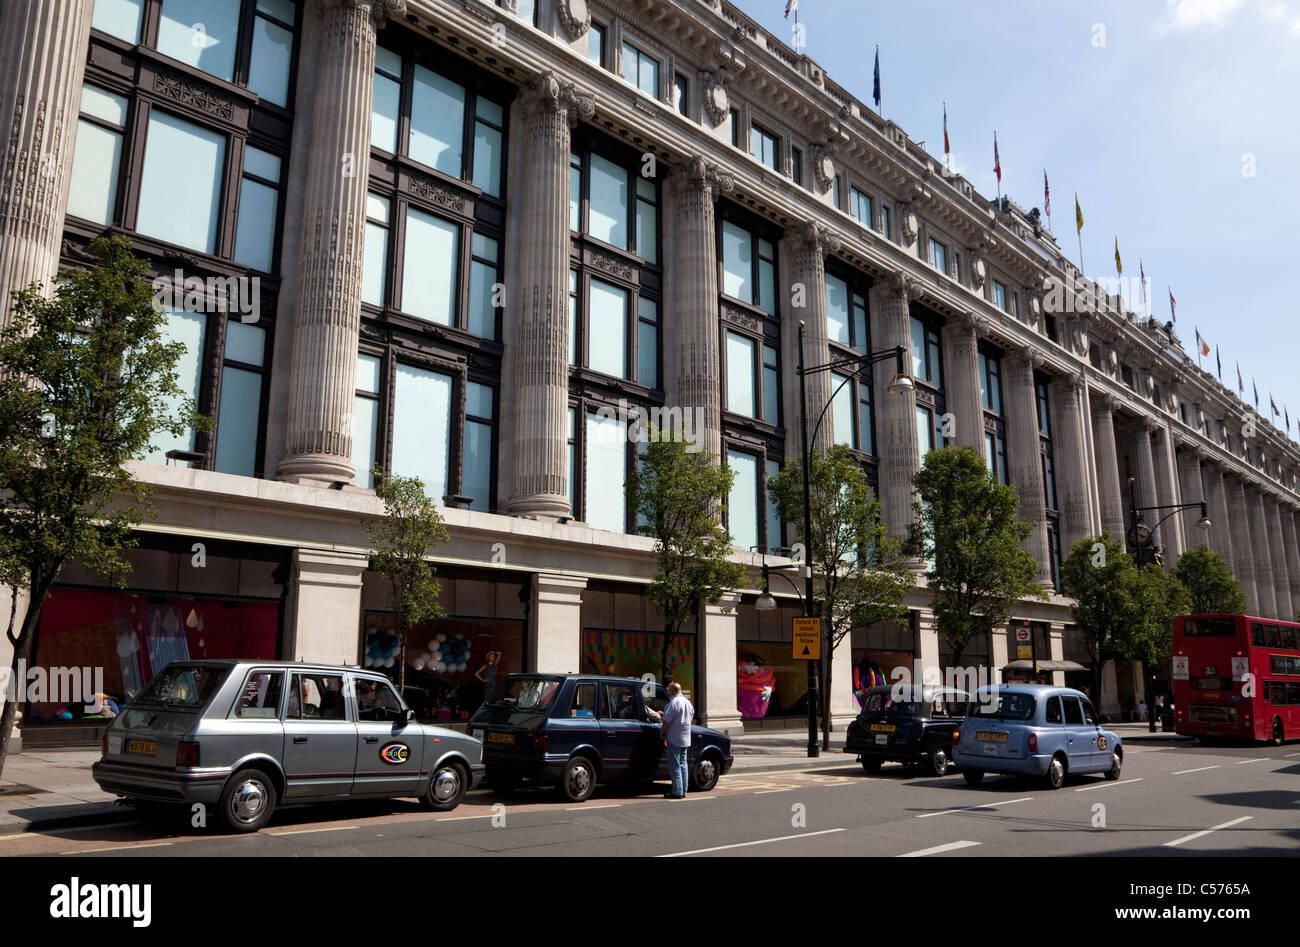 Selfridges store, Oxford Street, London - Stock Image